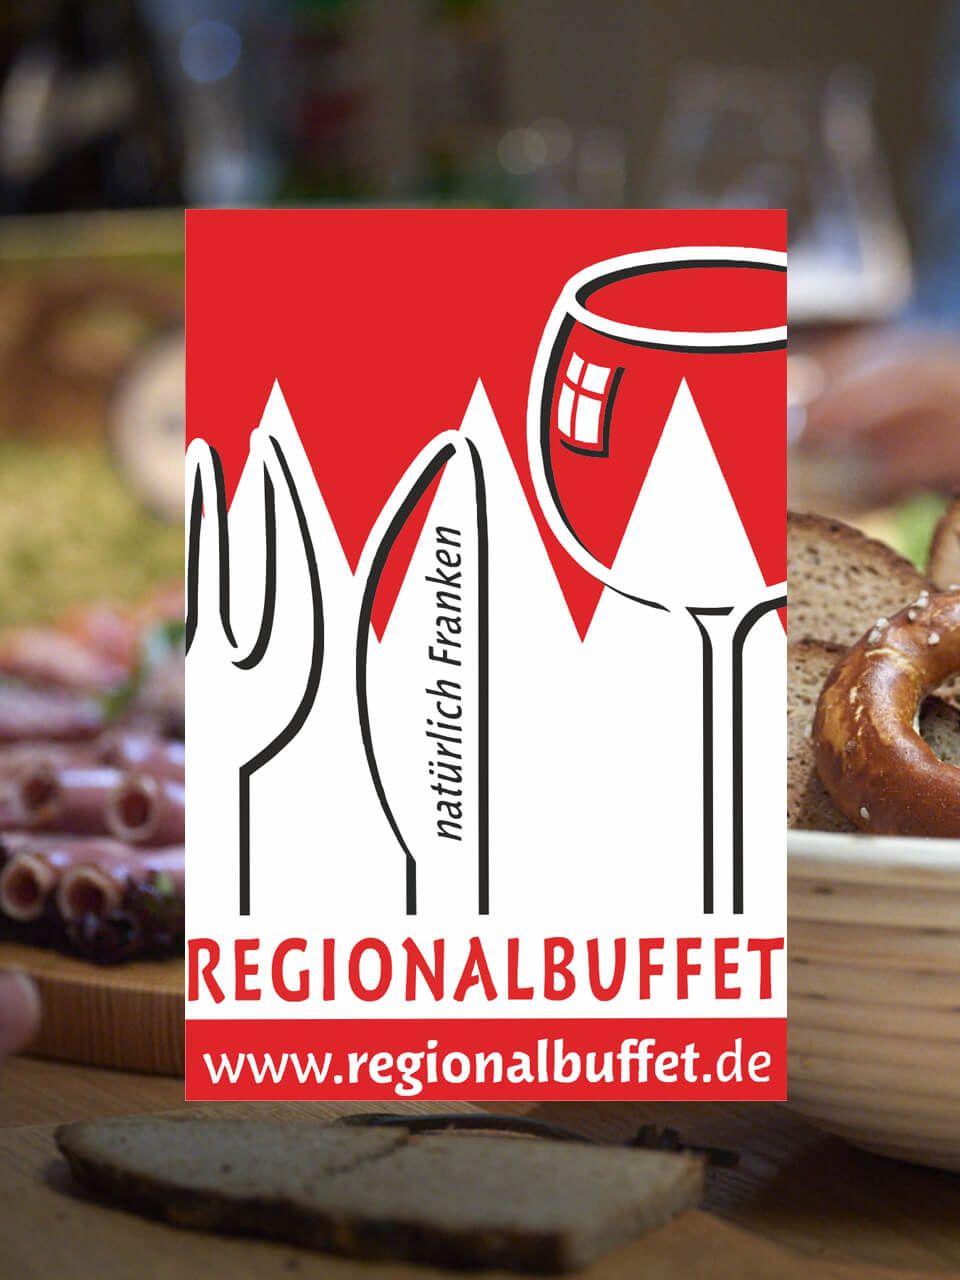 Regionalbuffet Bilder